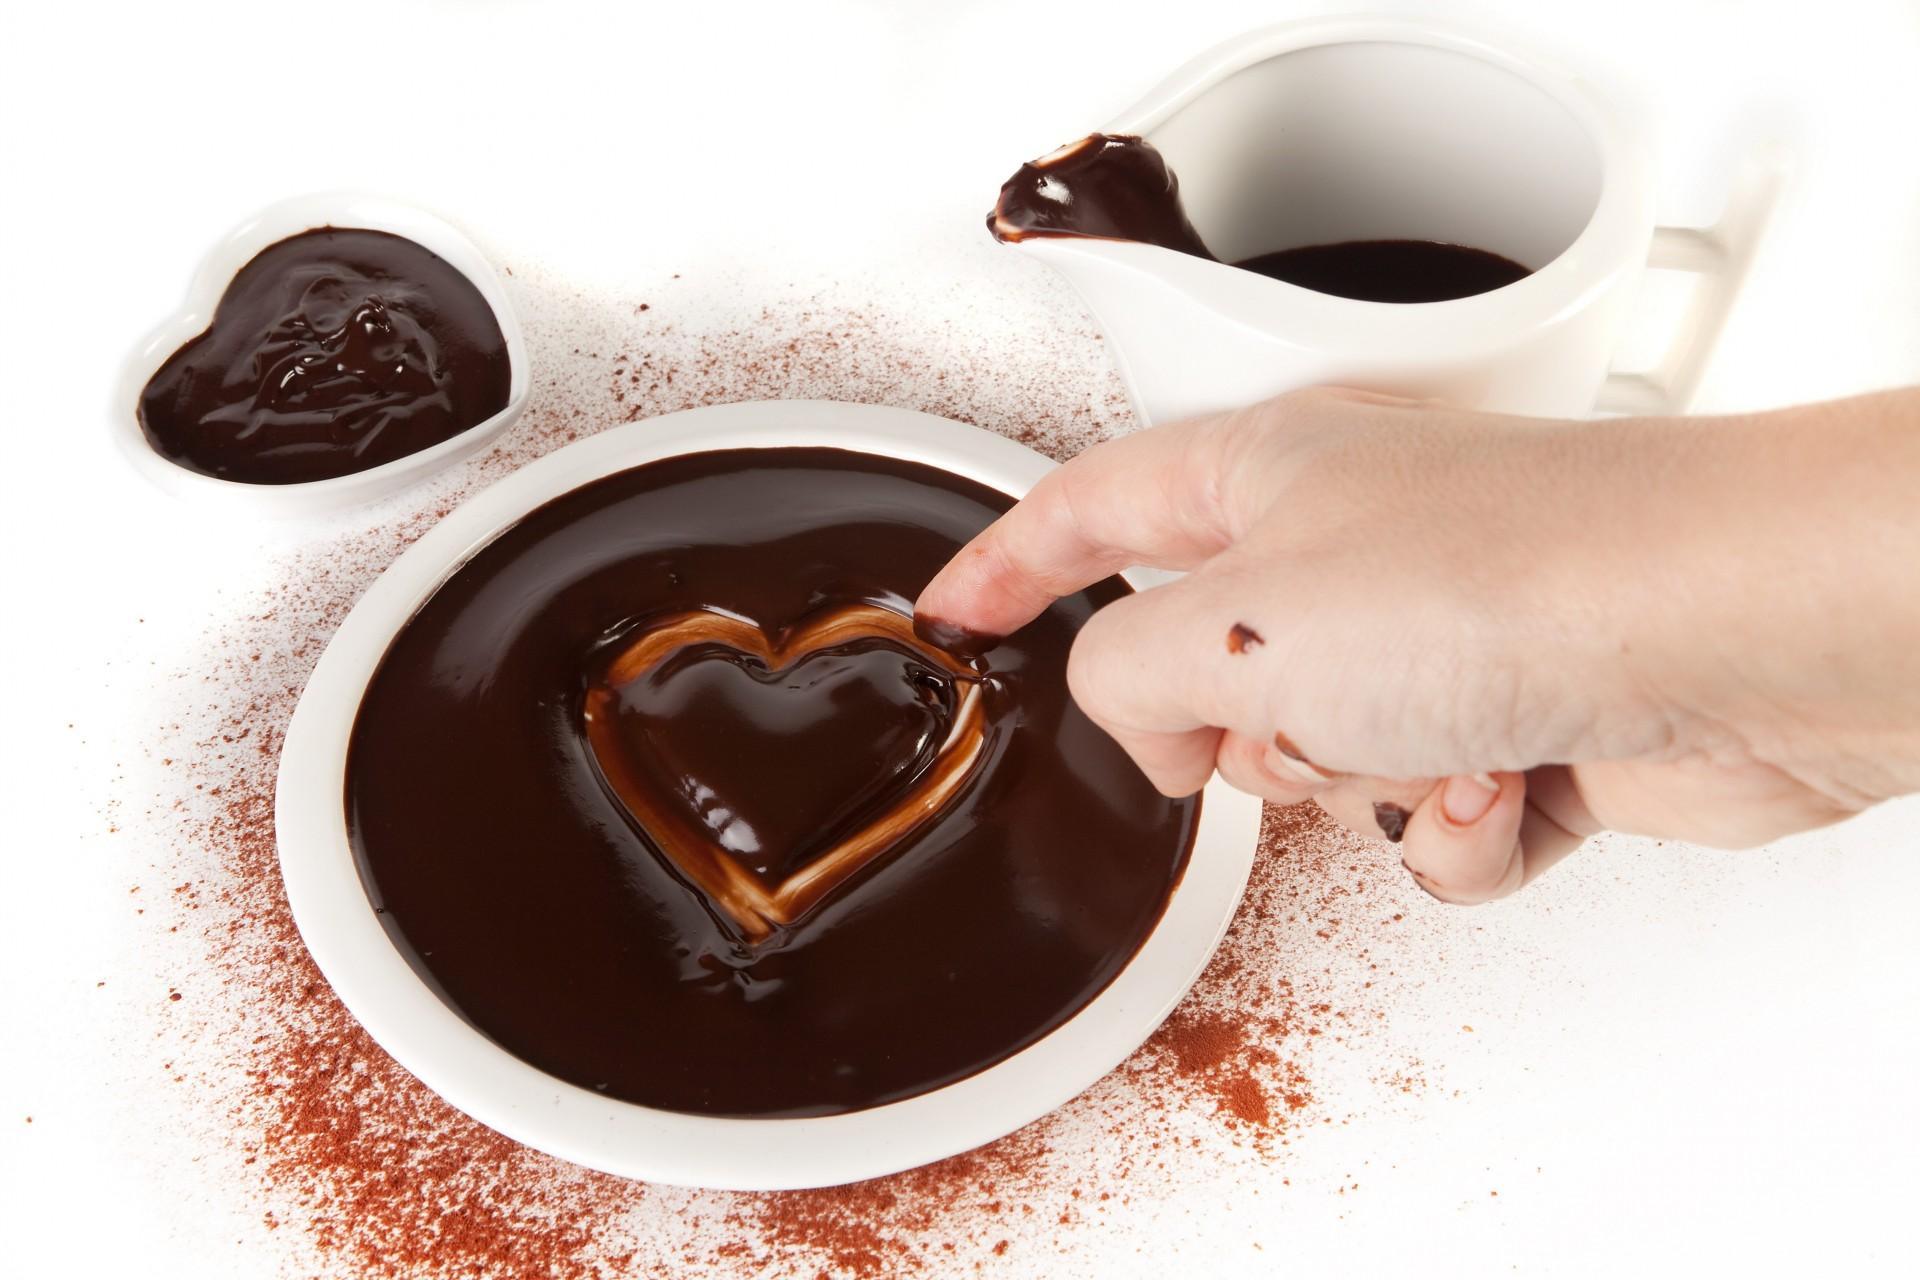 Напиток из шоколада своими руками